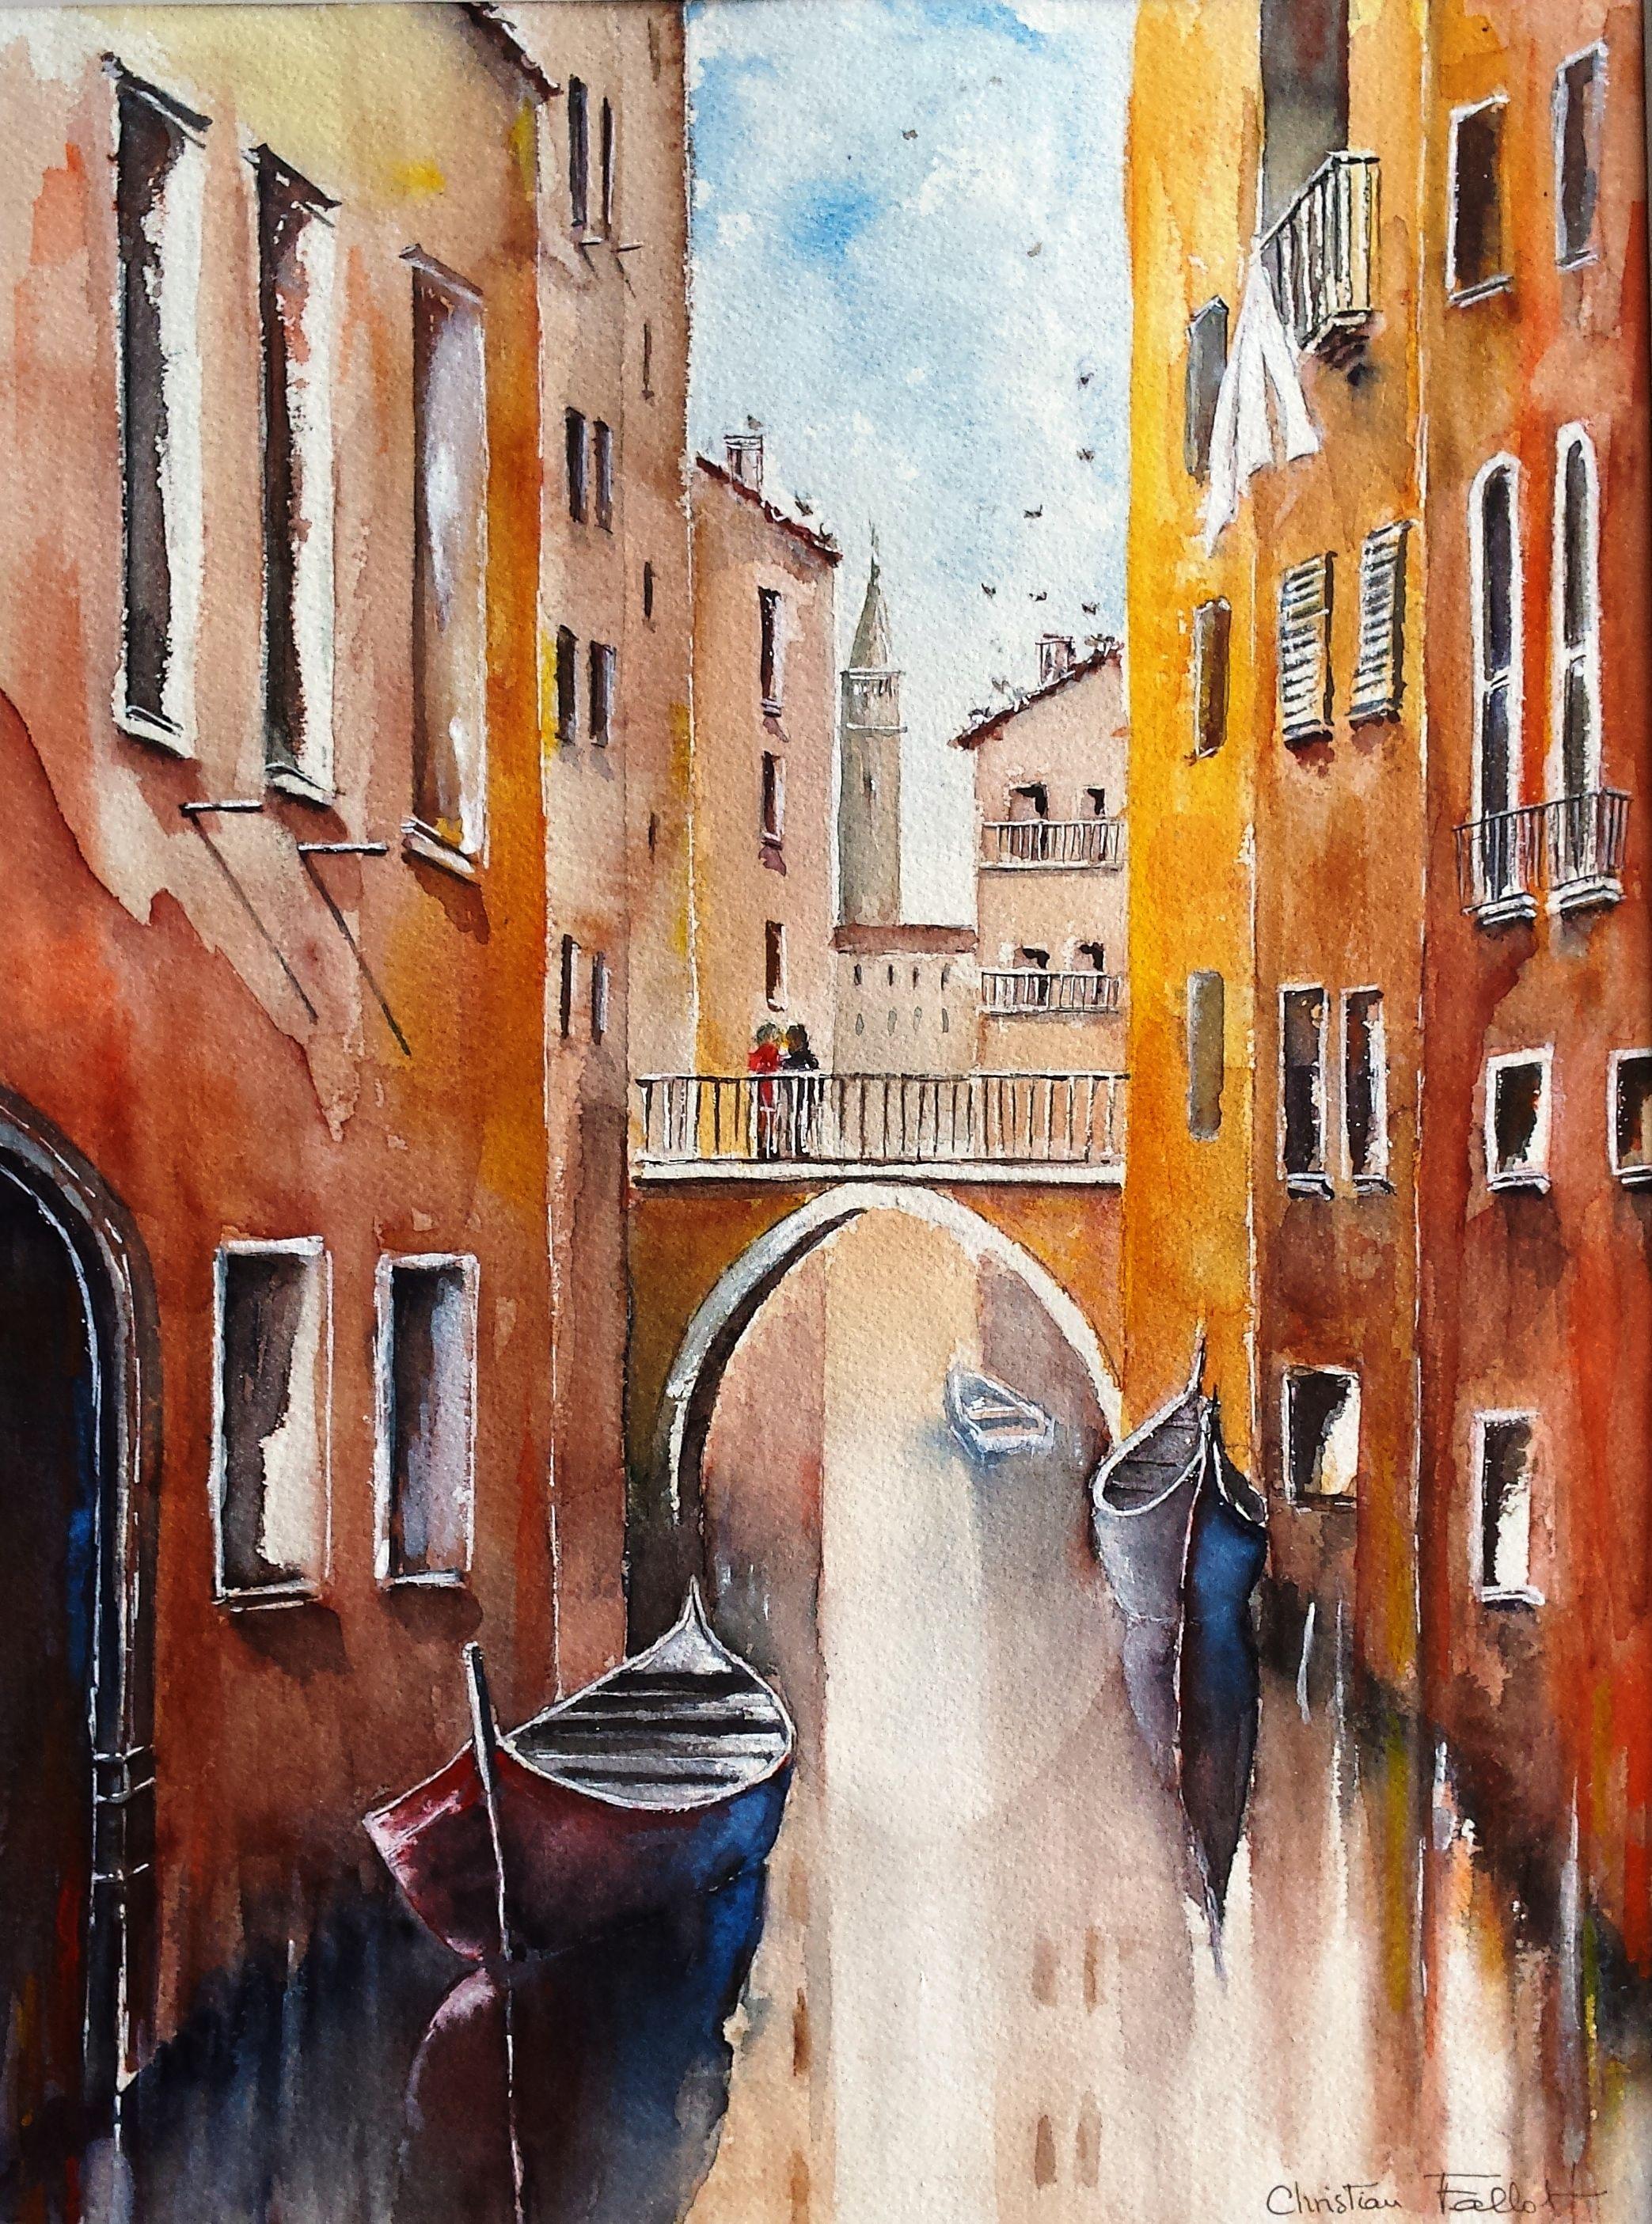 Christian Fallot Aquarelle Venise Gondoles Aquarelle Peinture